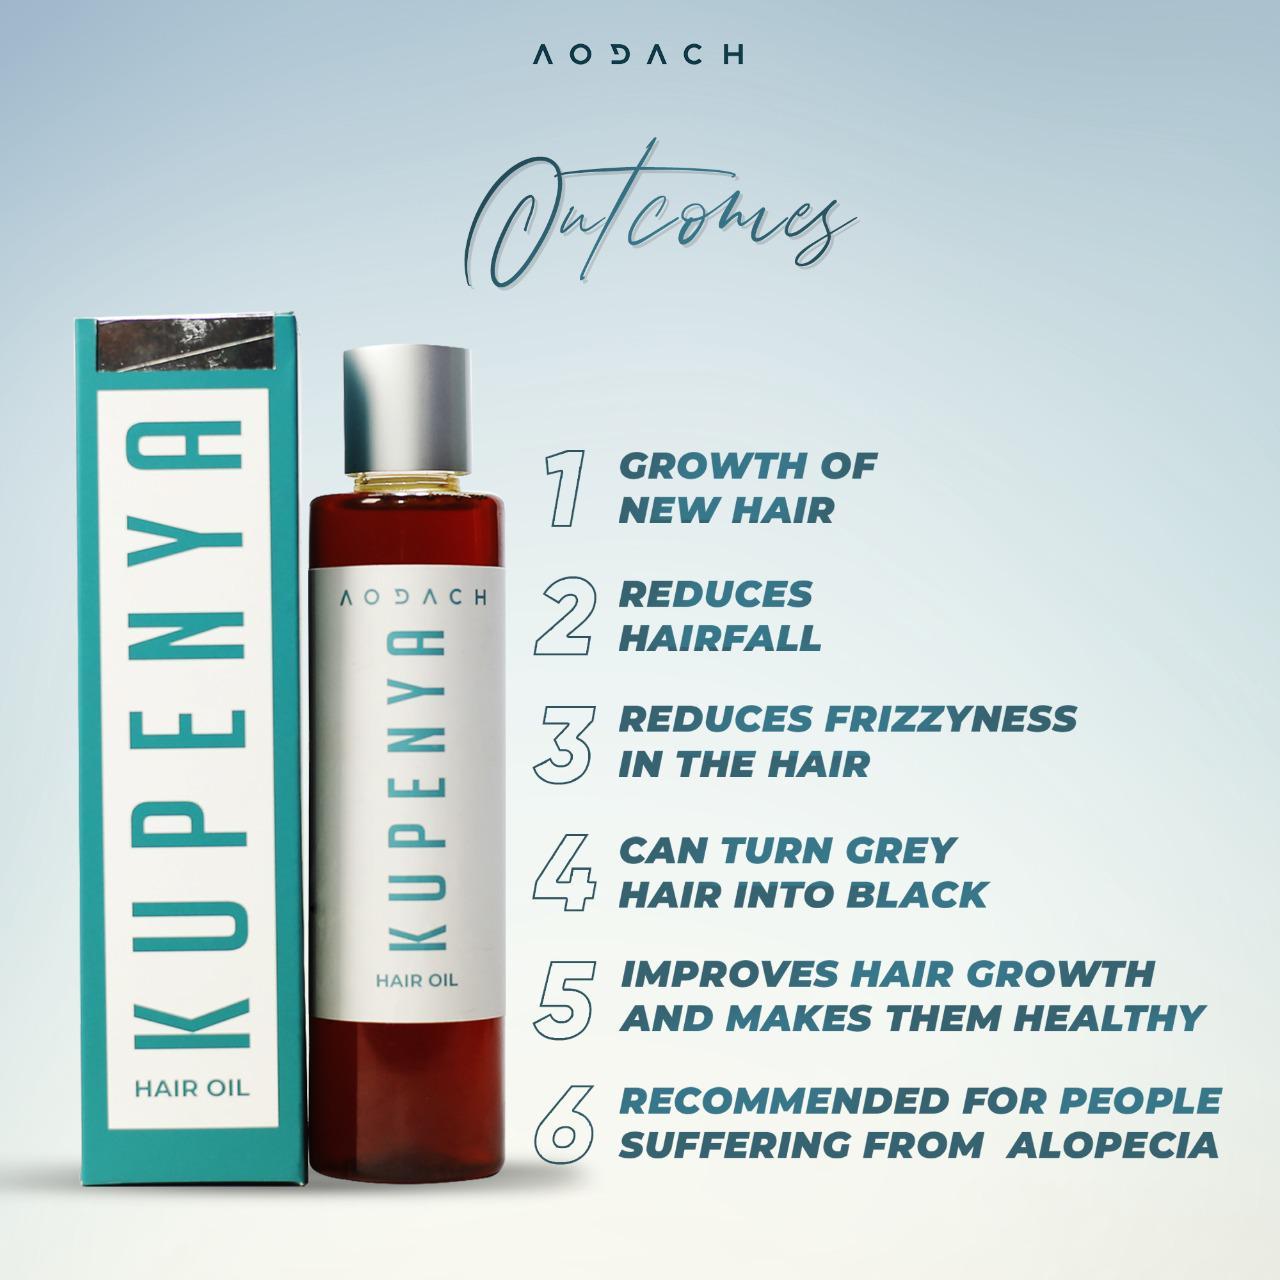 Kupenya Hair Oil - 24 Ingredients Natural Hair Growth Oil For Men and Women - 200 ml